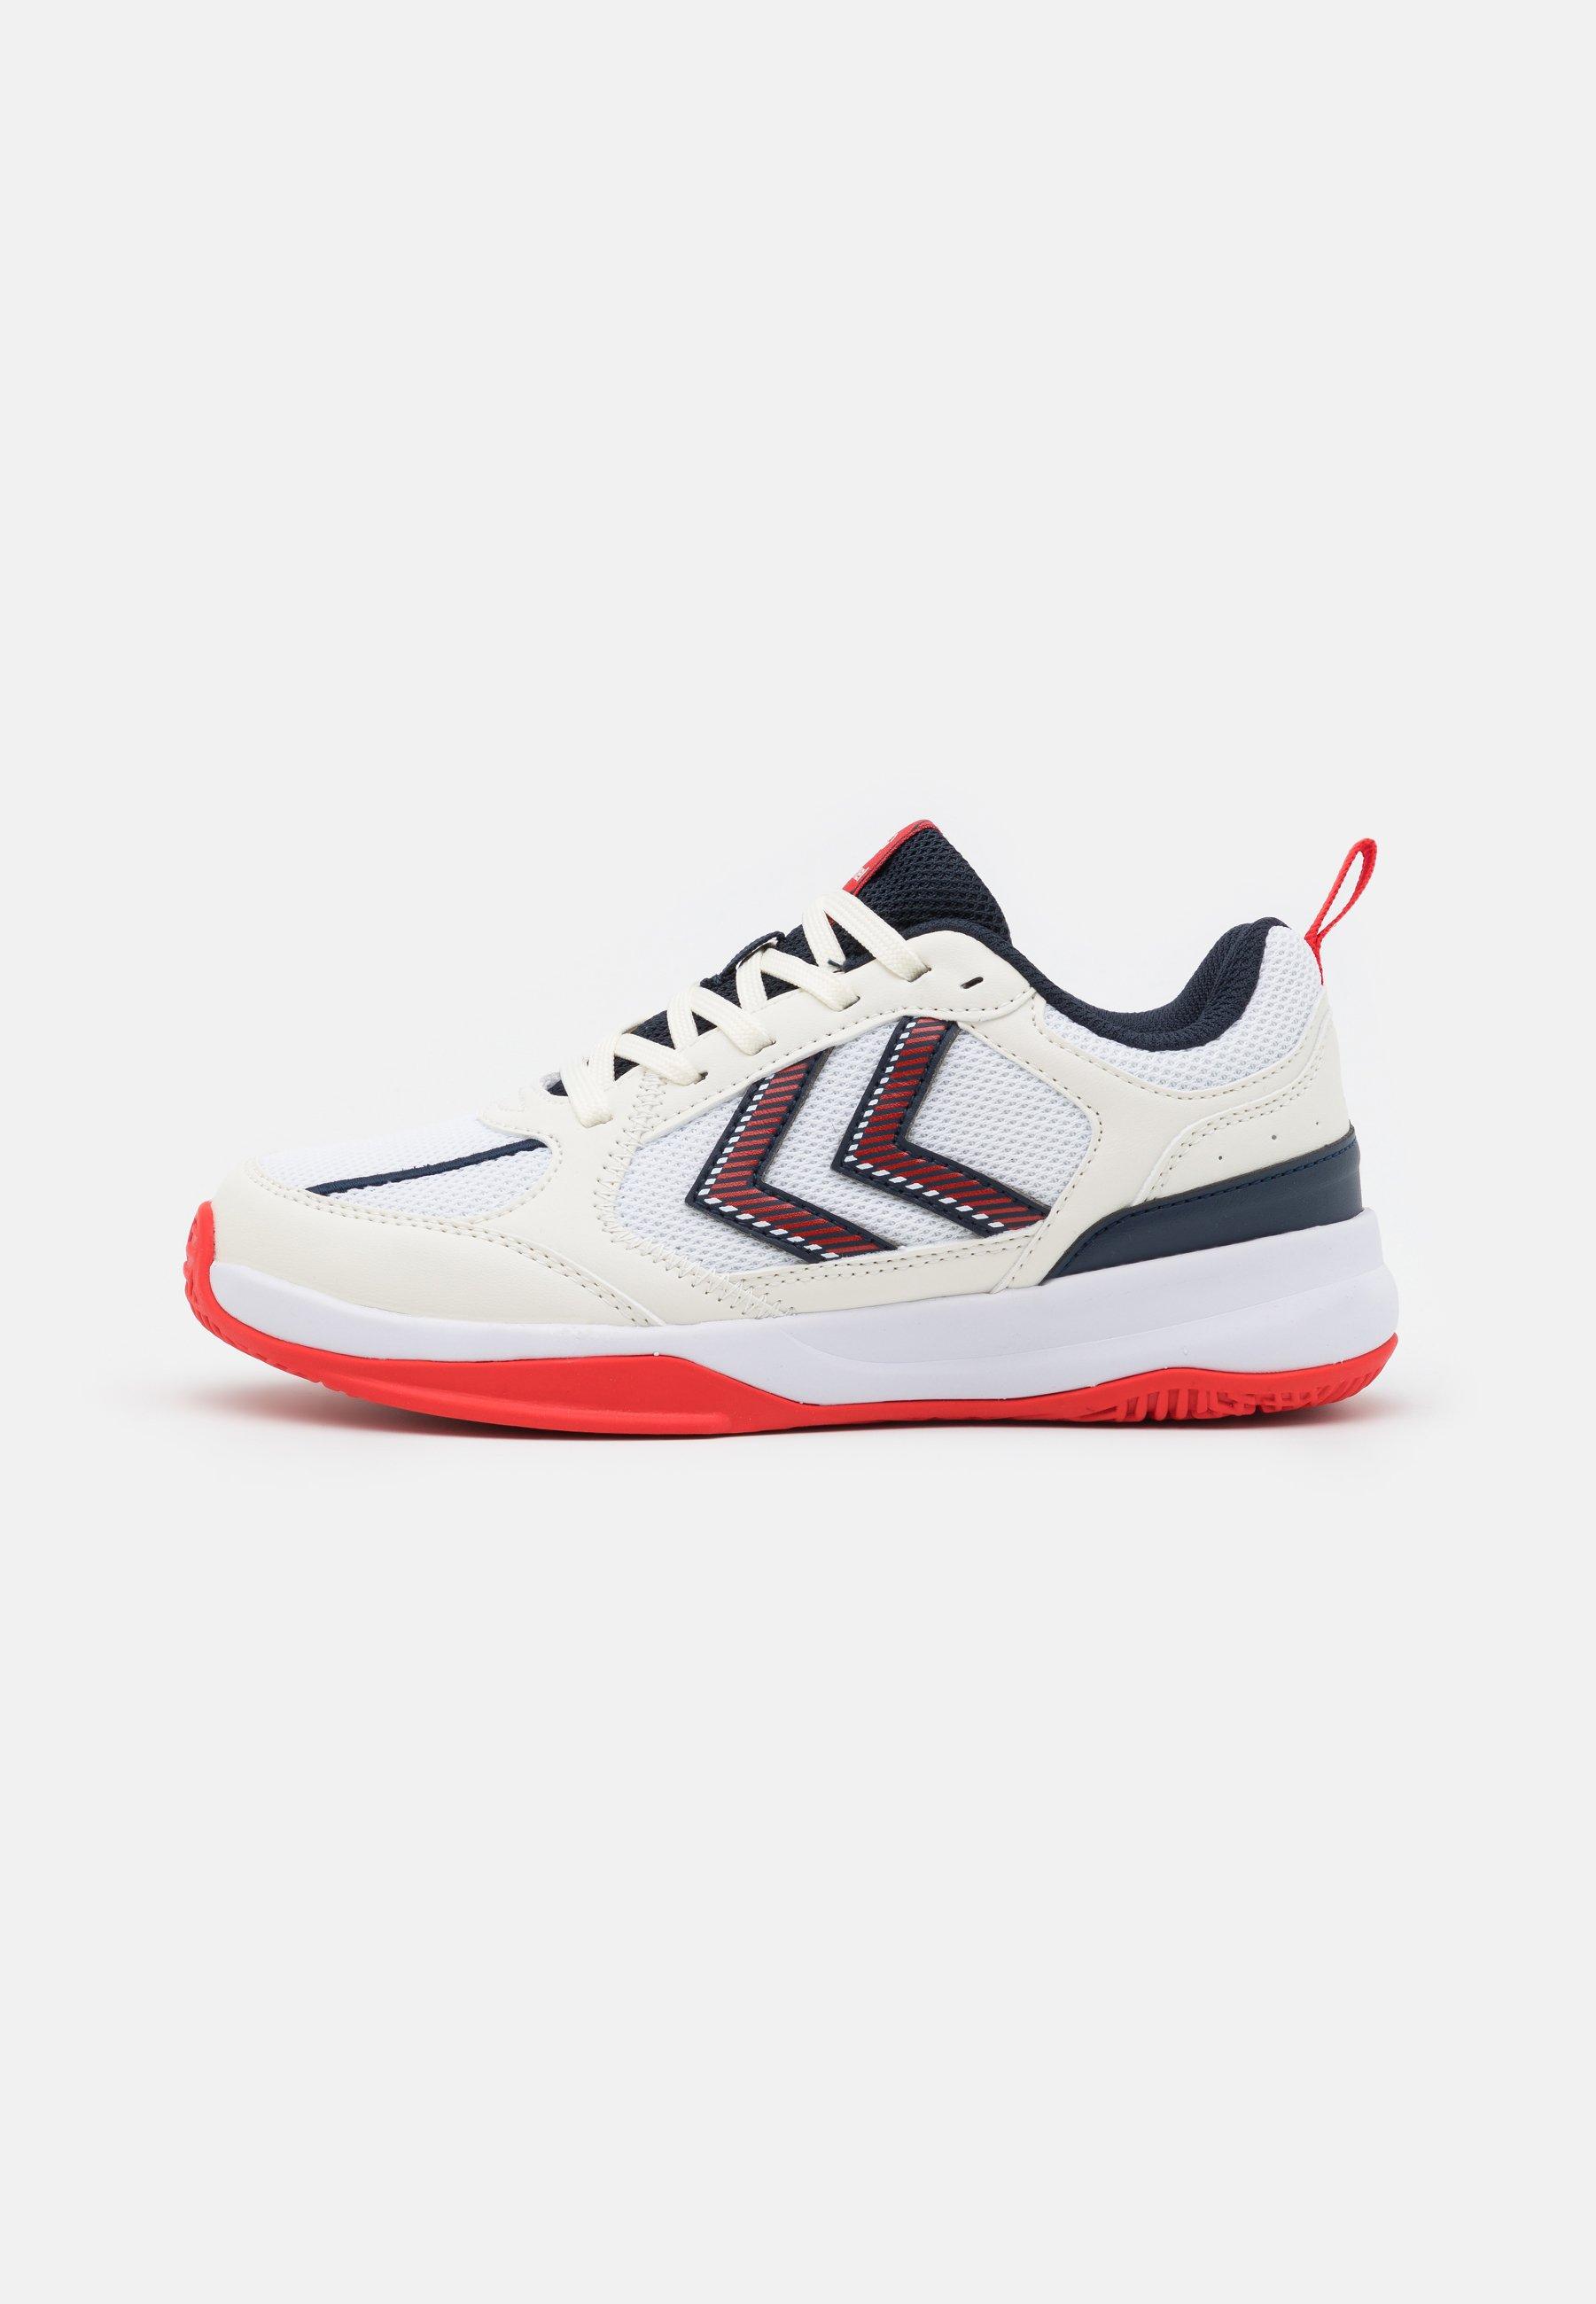 Enfant DAGAZ JR UNISEX - Chaussures de handball